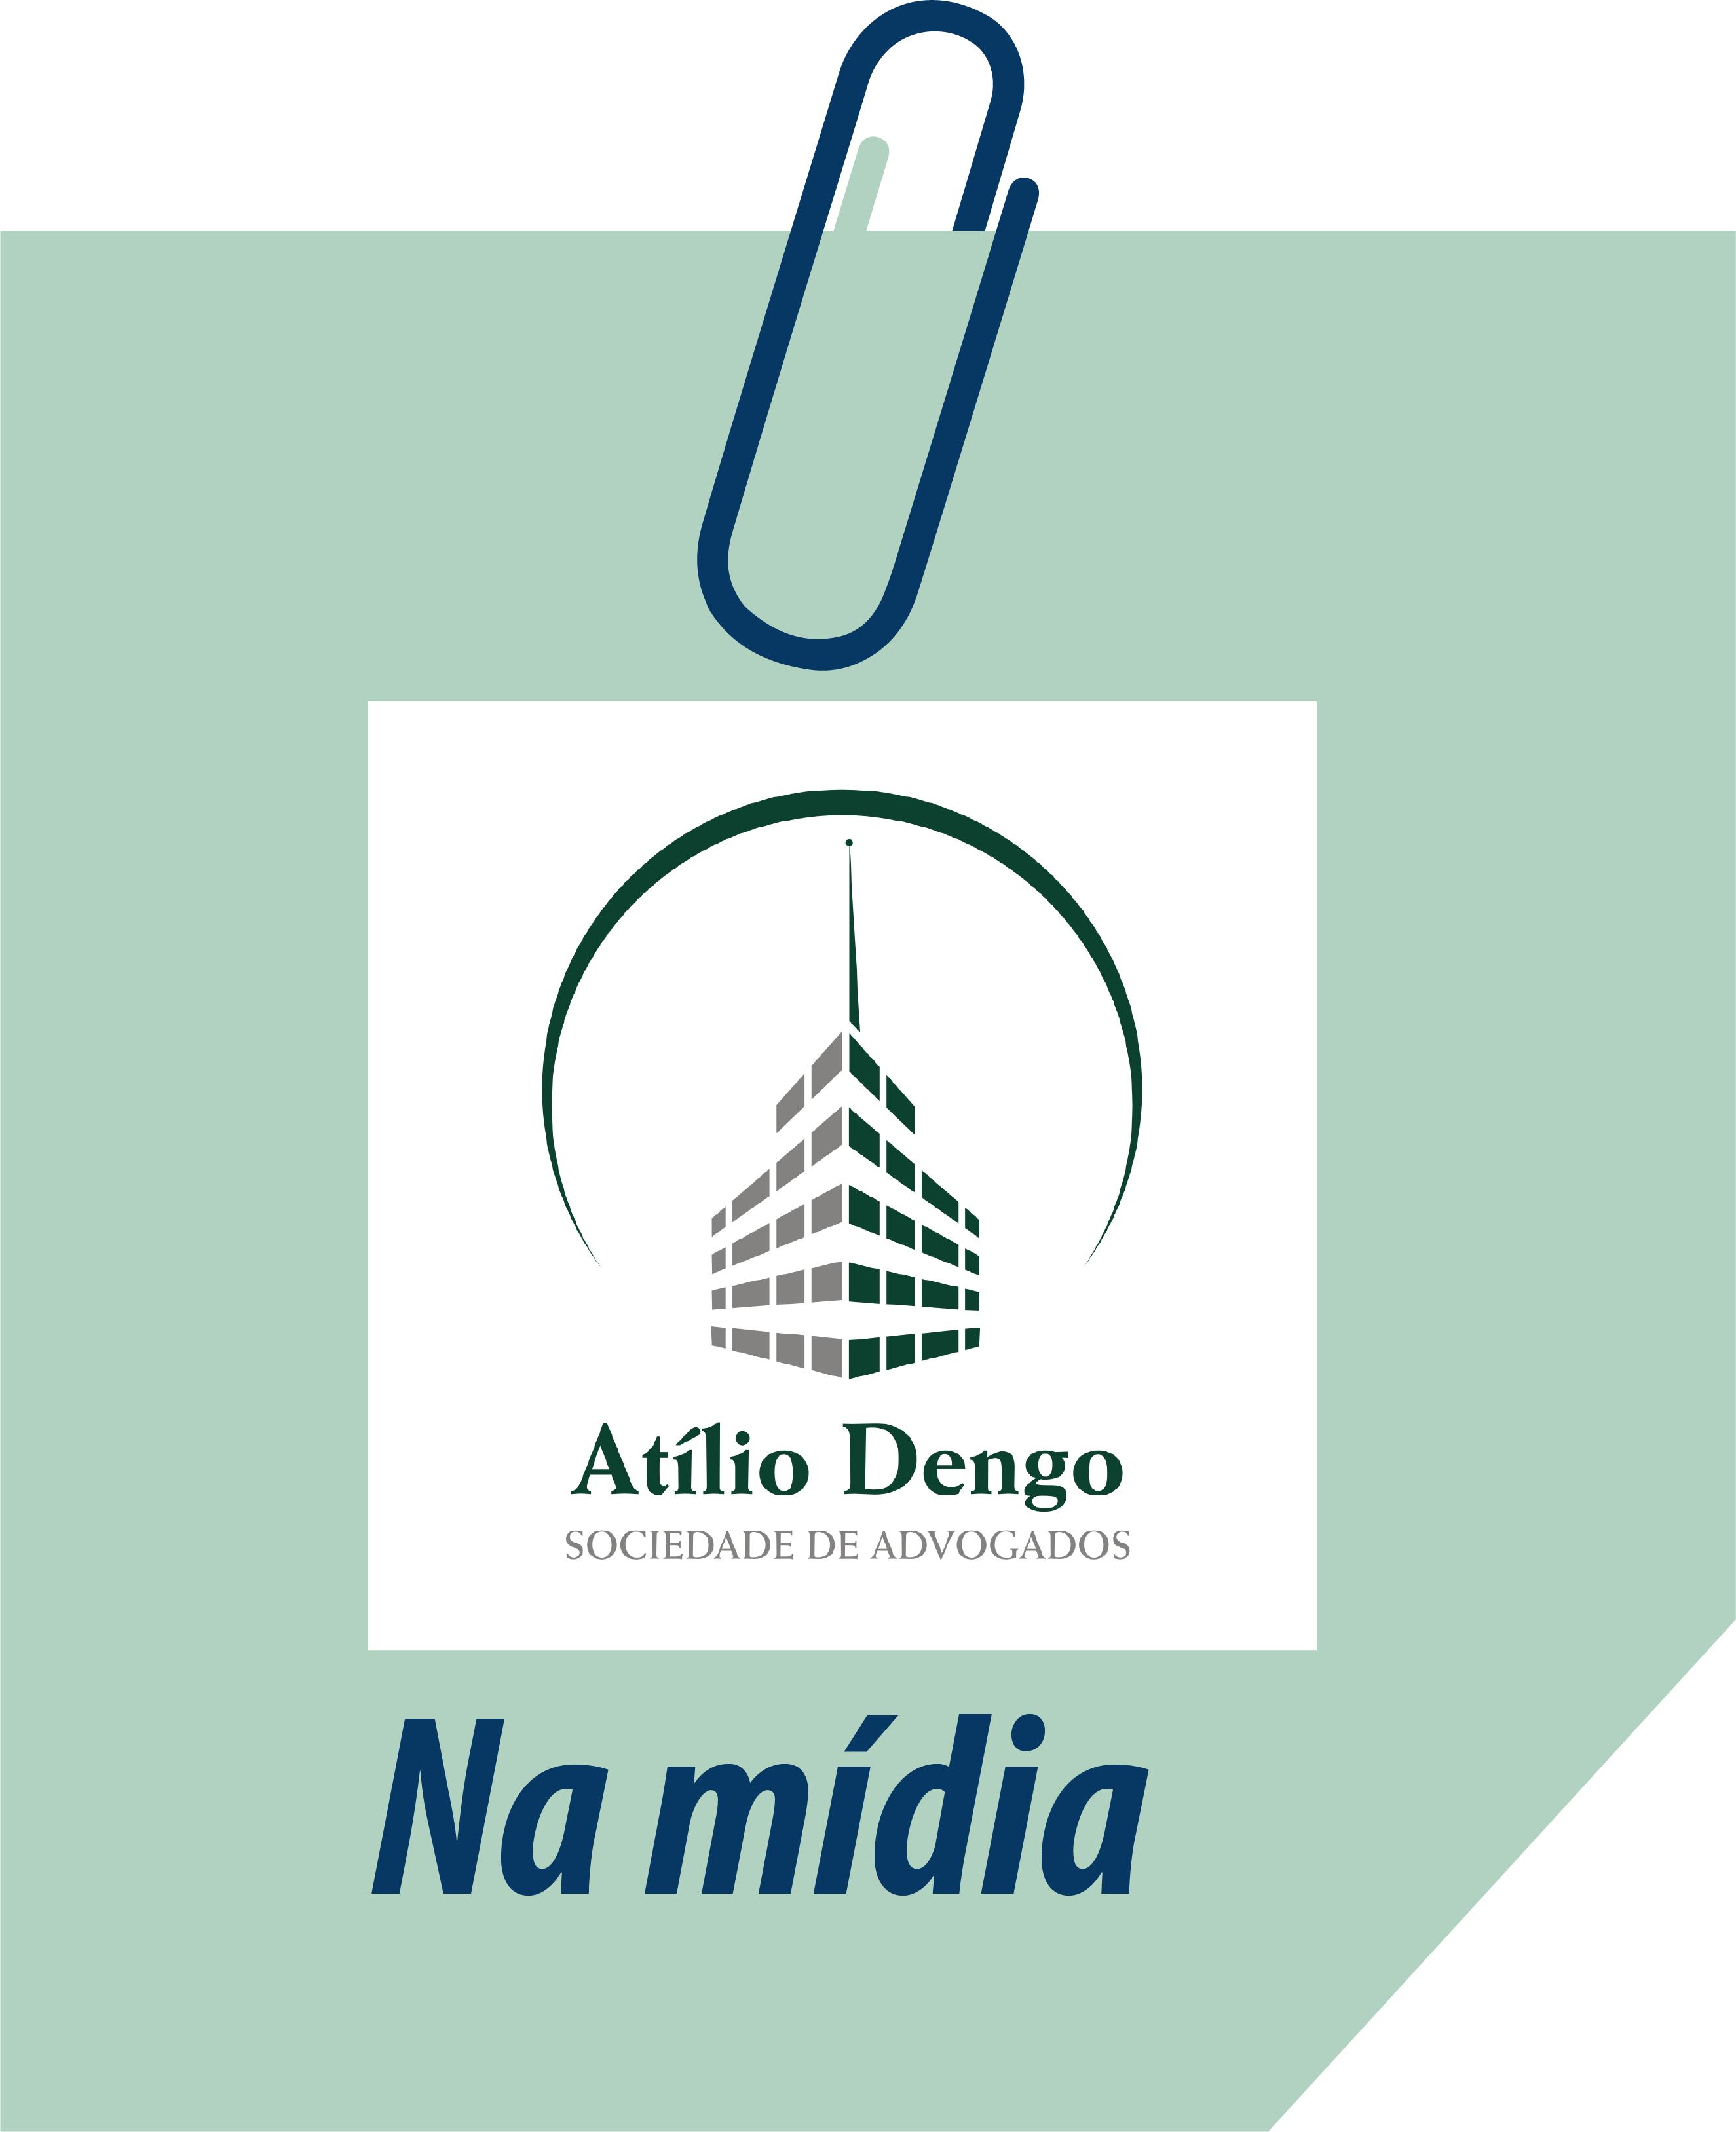 Atilio Dengo na Mídia